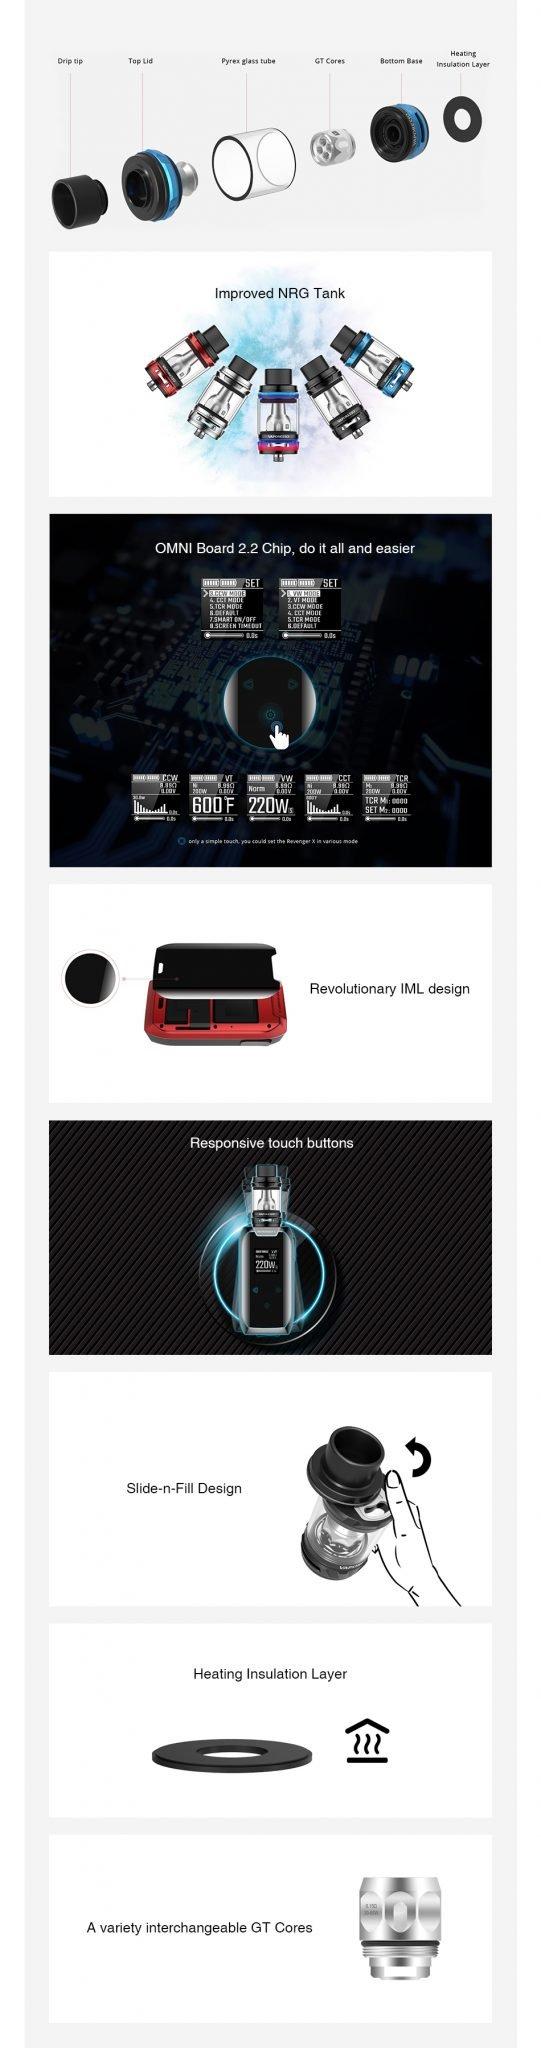 Vaporesso Revenger X Kit Features UK